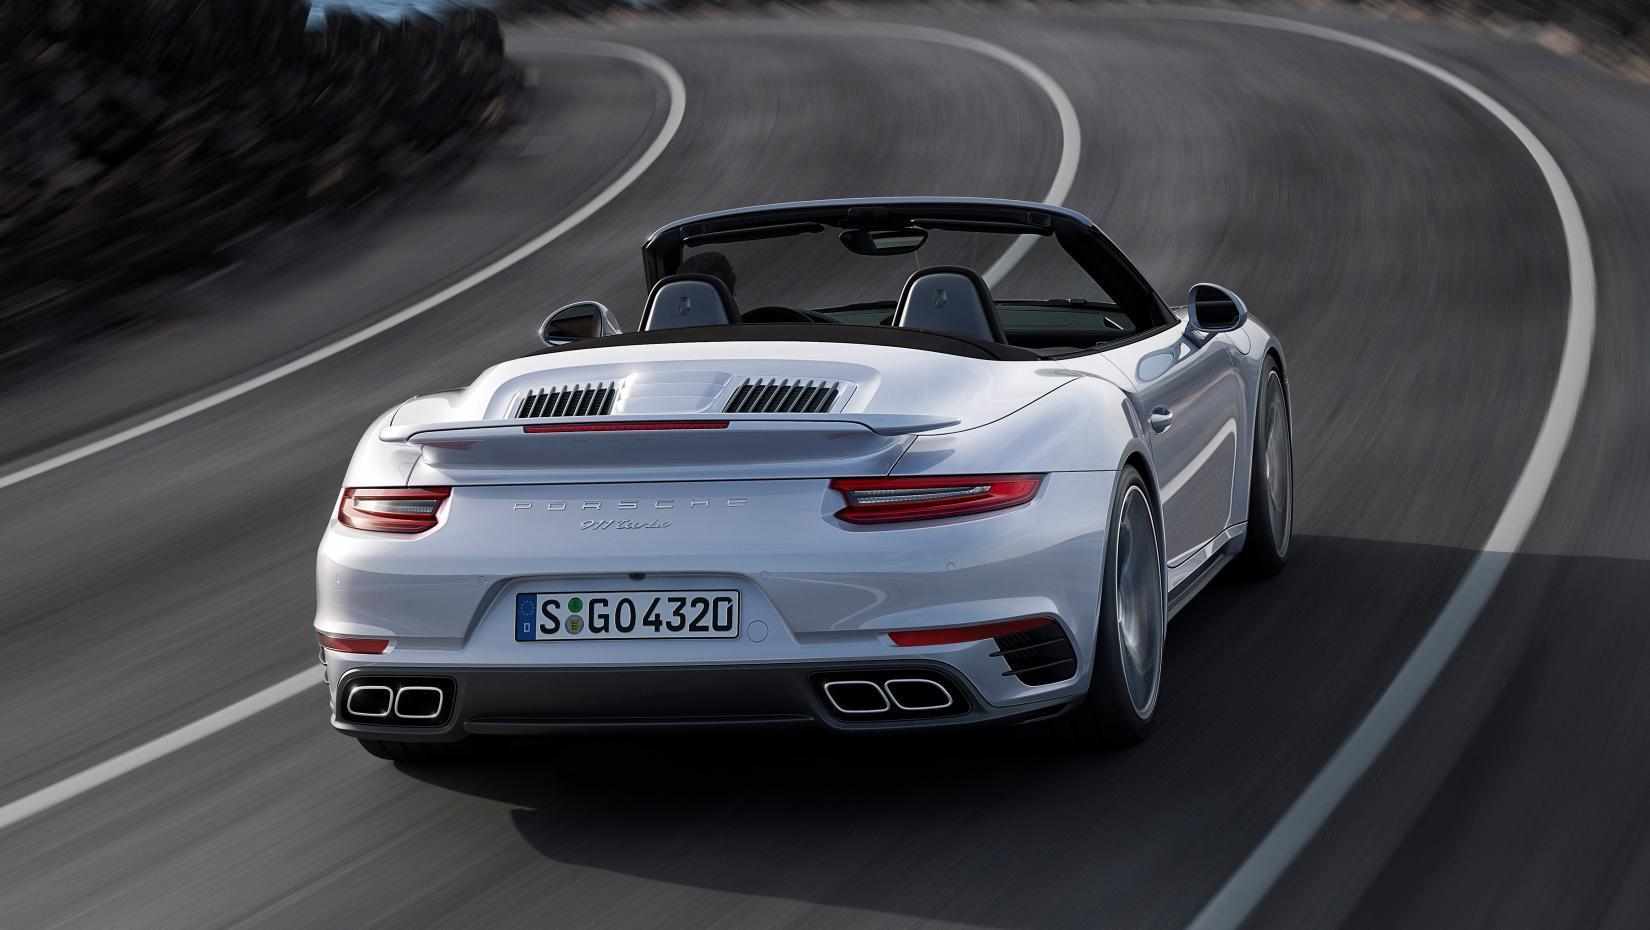 Porsche 911 turbo 2017 8 10